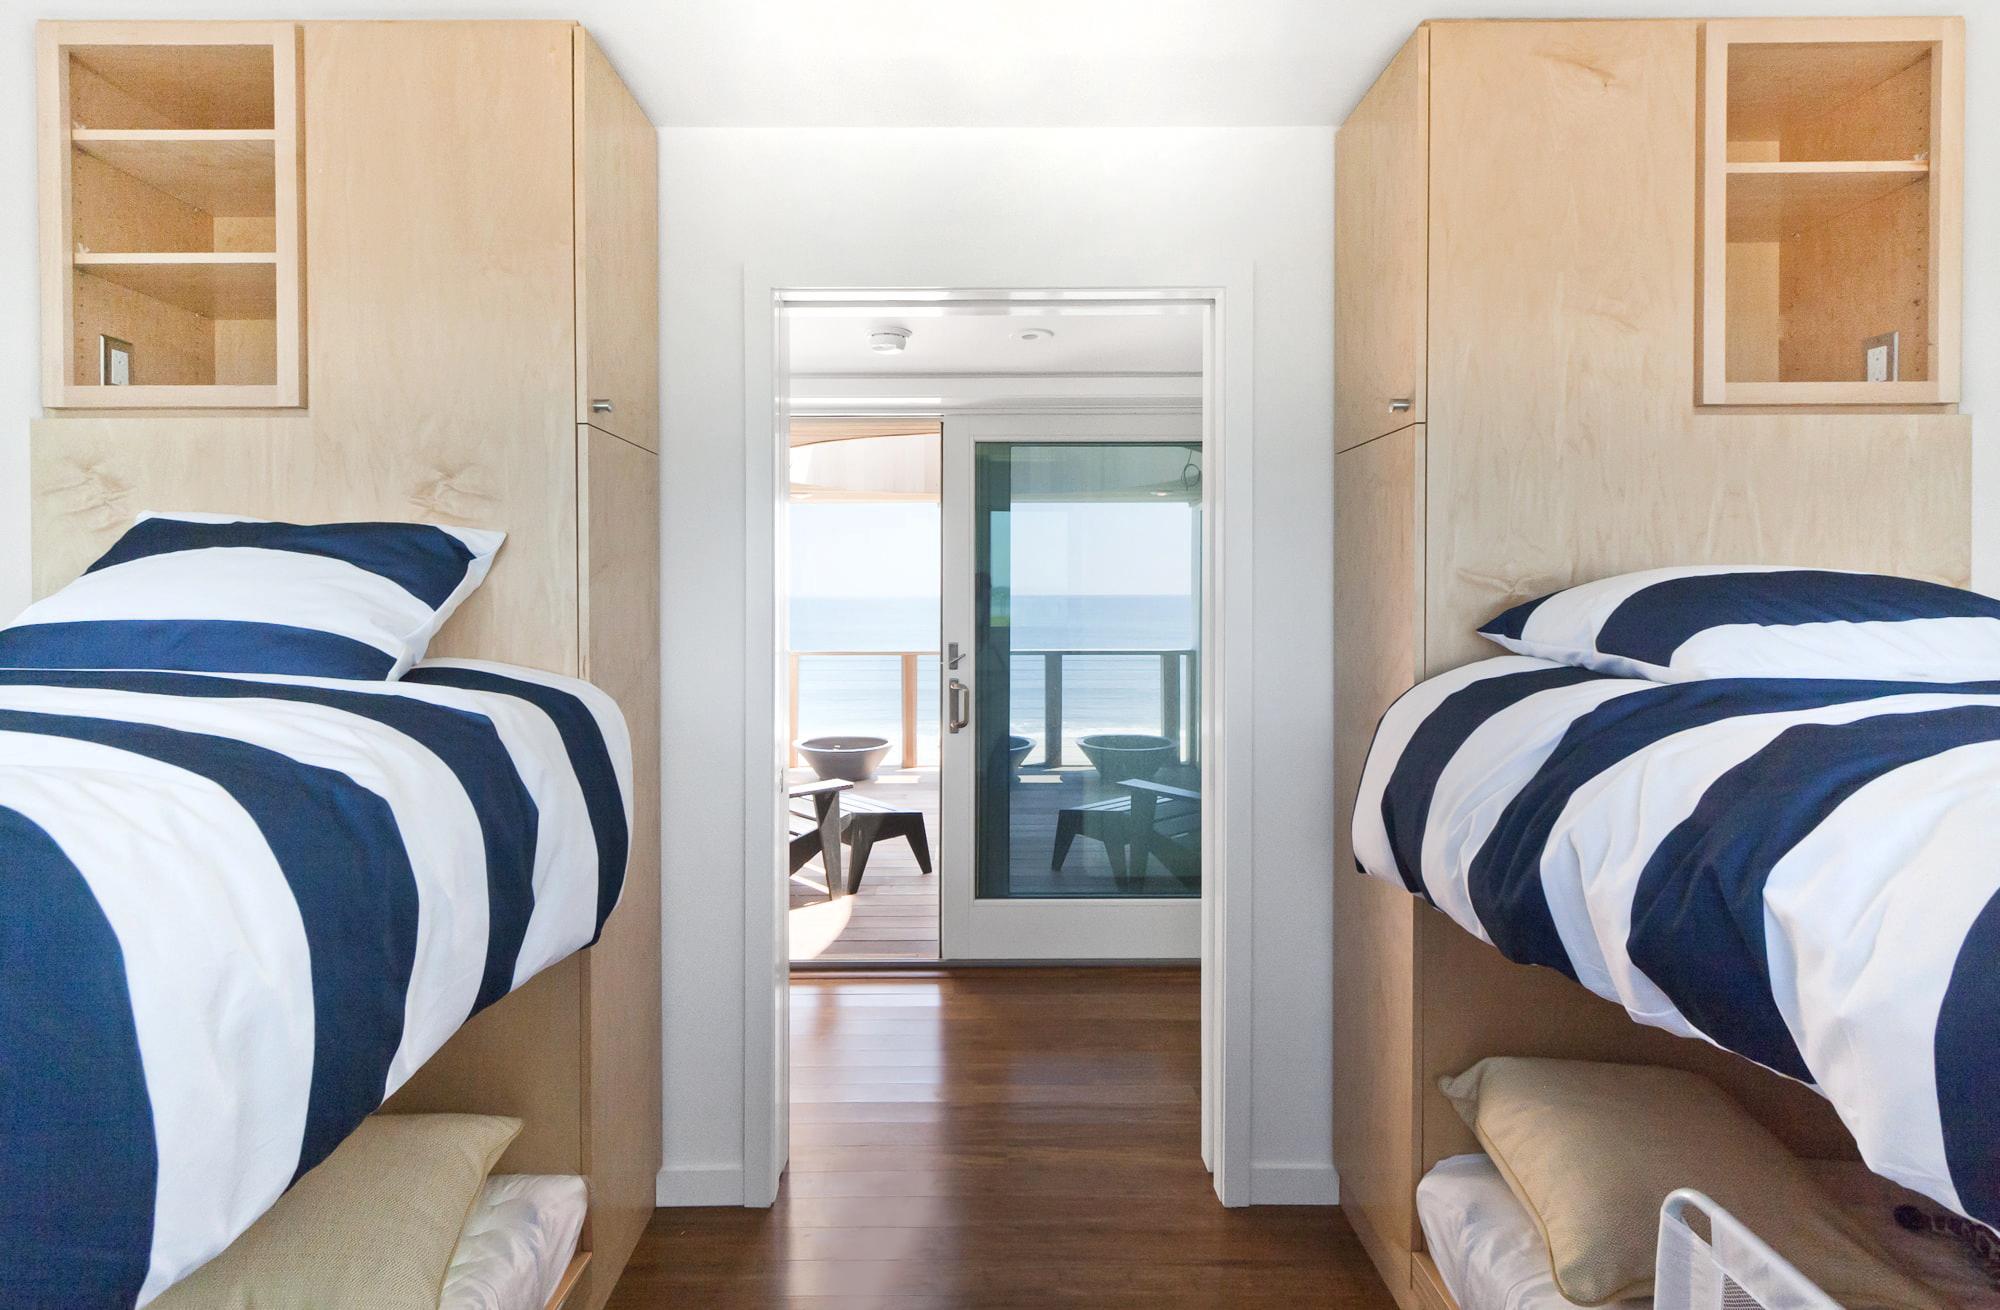 10-res4-resolution-4-architecture-modern-modular-home-prefab-dune-road-beach-house-interior-bedroom.jpg